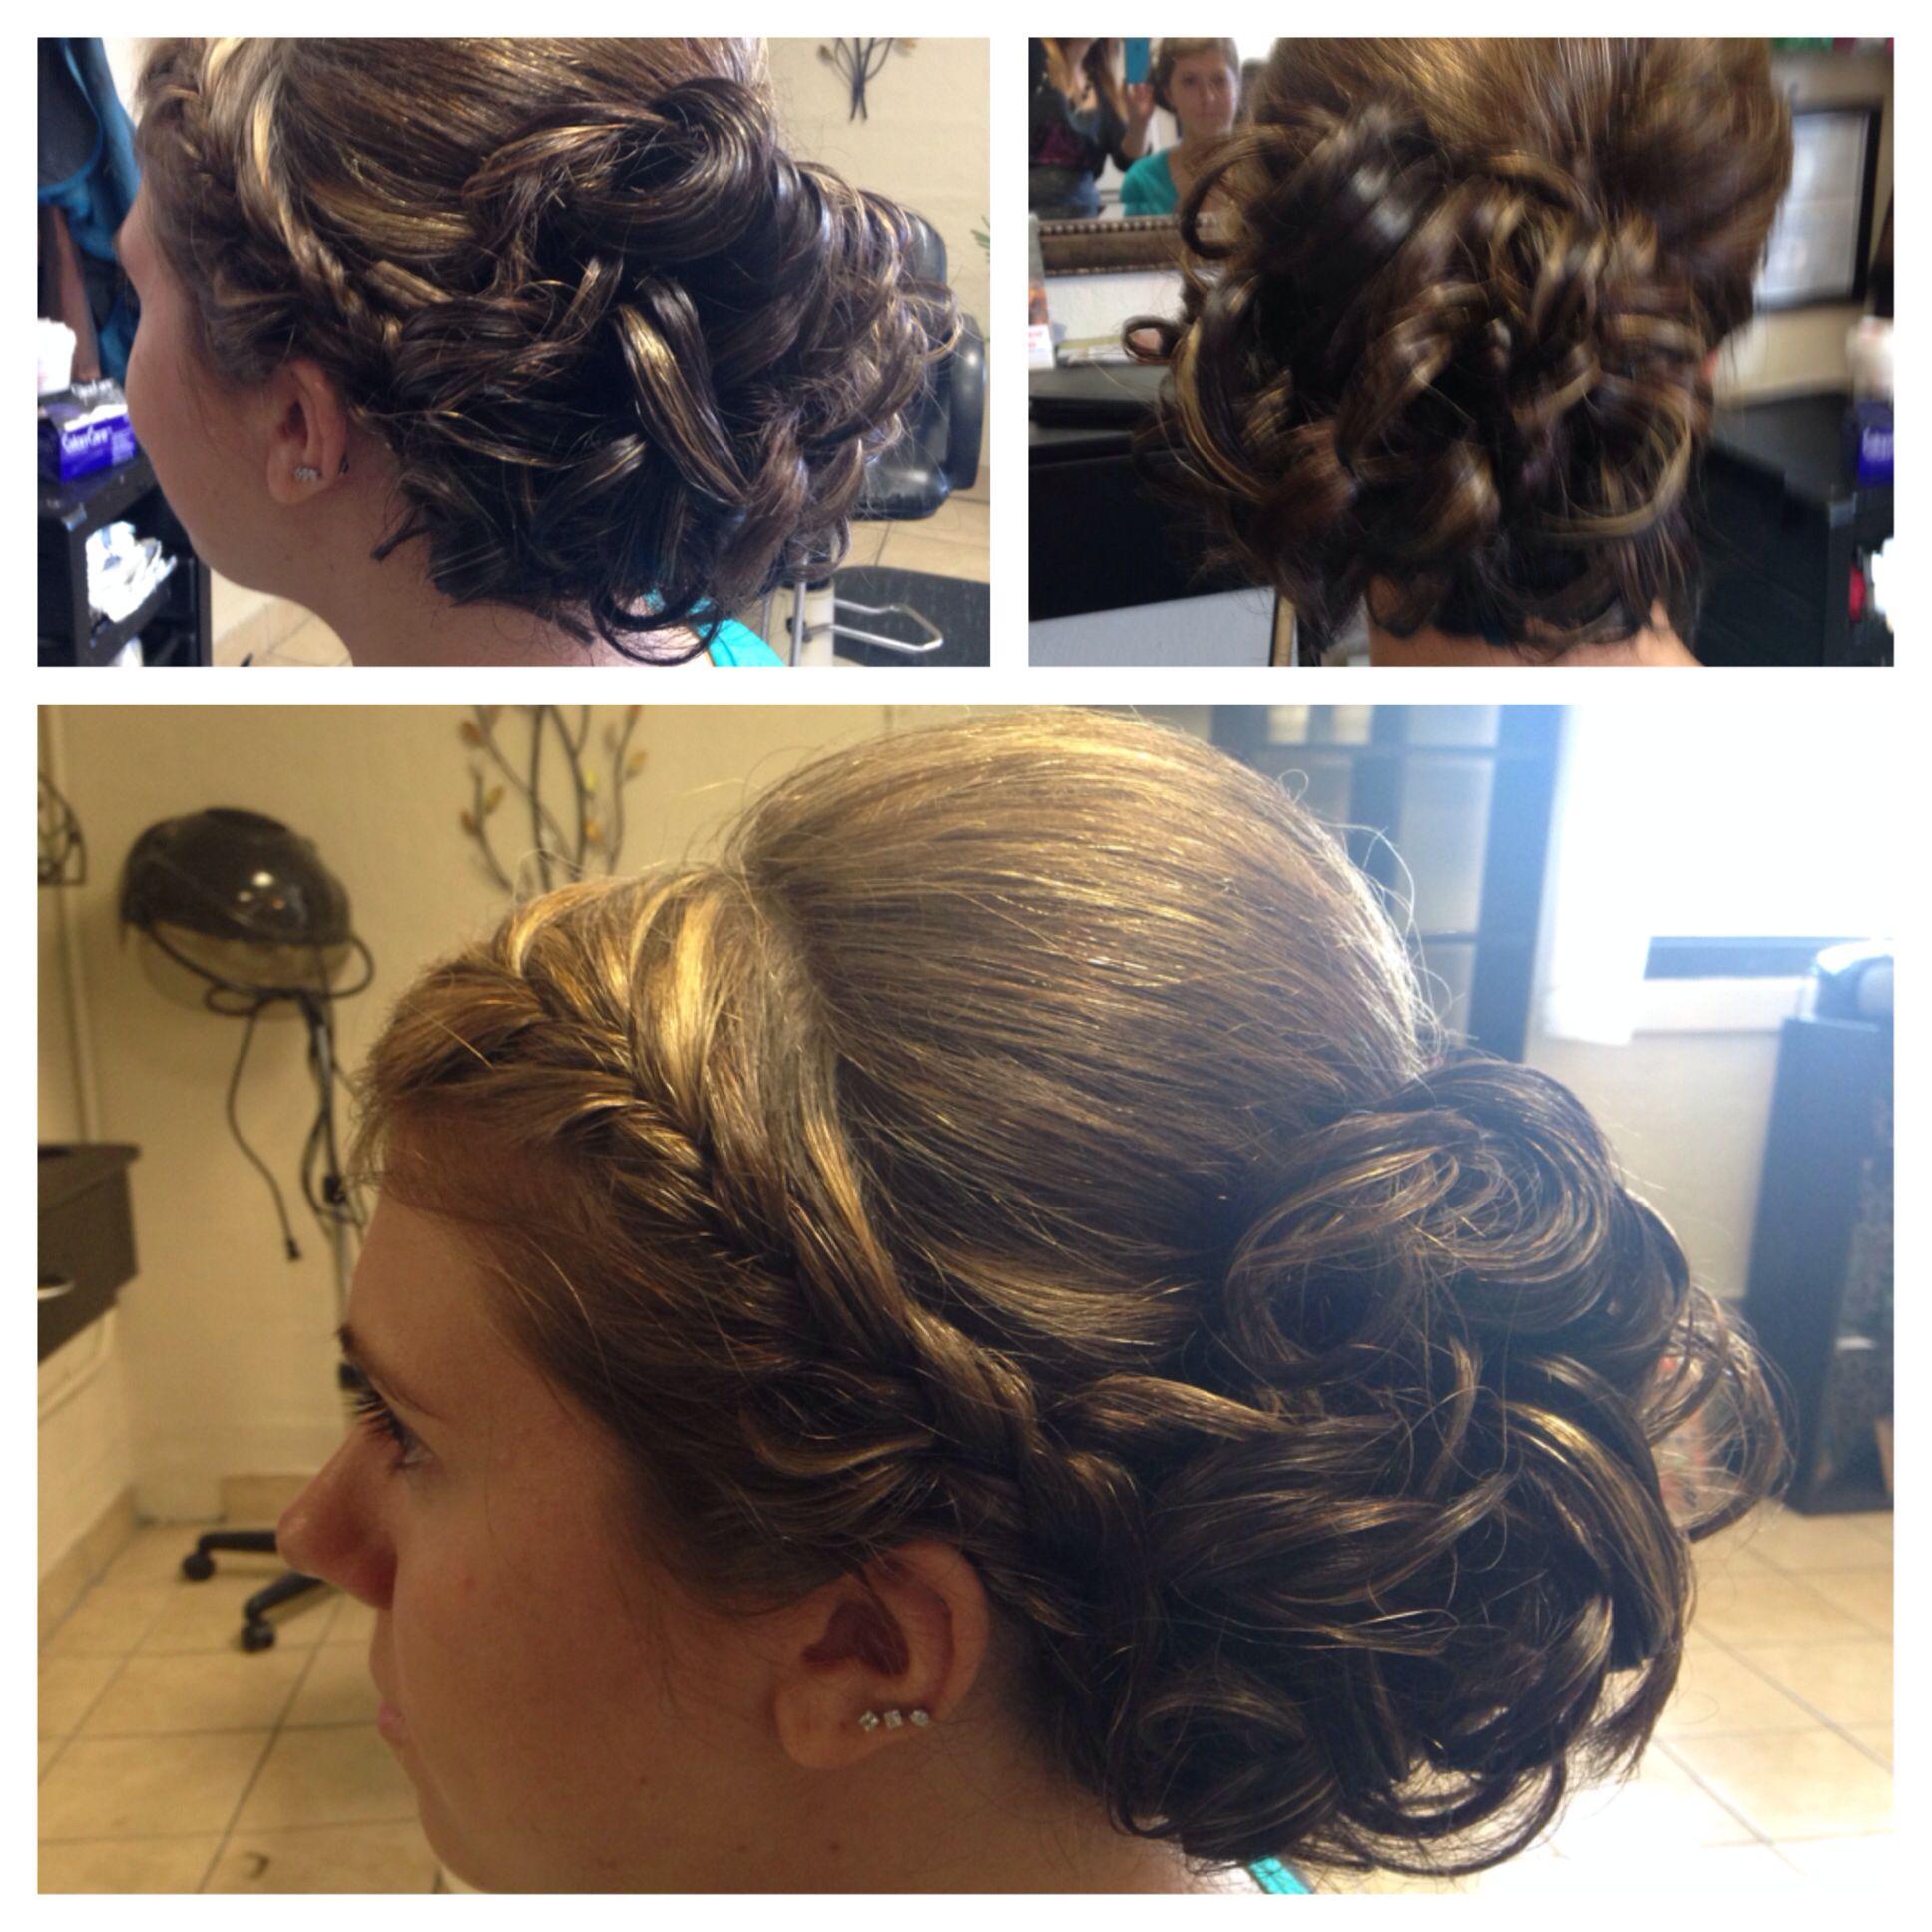 Prom hair 2014 | Hair styles 2014, Hair, Prom hair